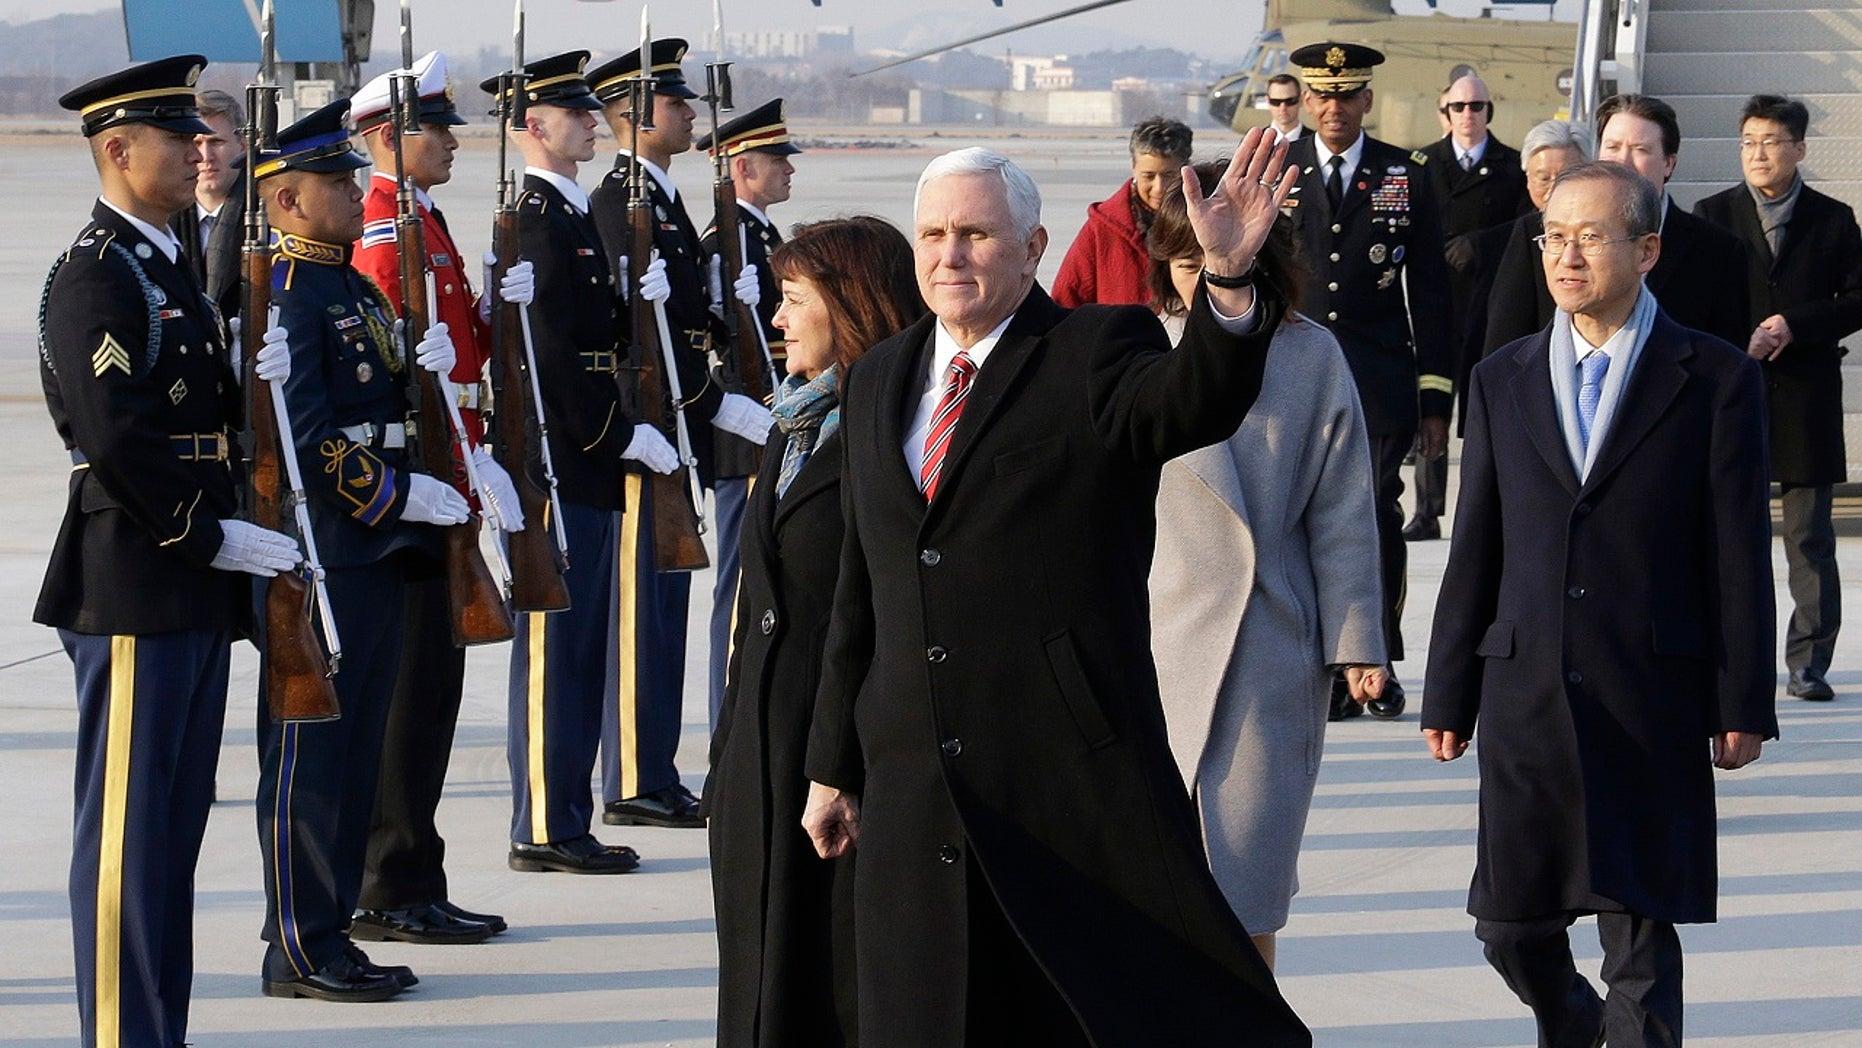 Vice President Mike Pence waves upon his arrival at Osan Air Base in Pyeongtaek, South Korea, Feb. 8, 2018.